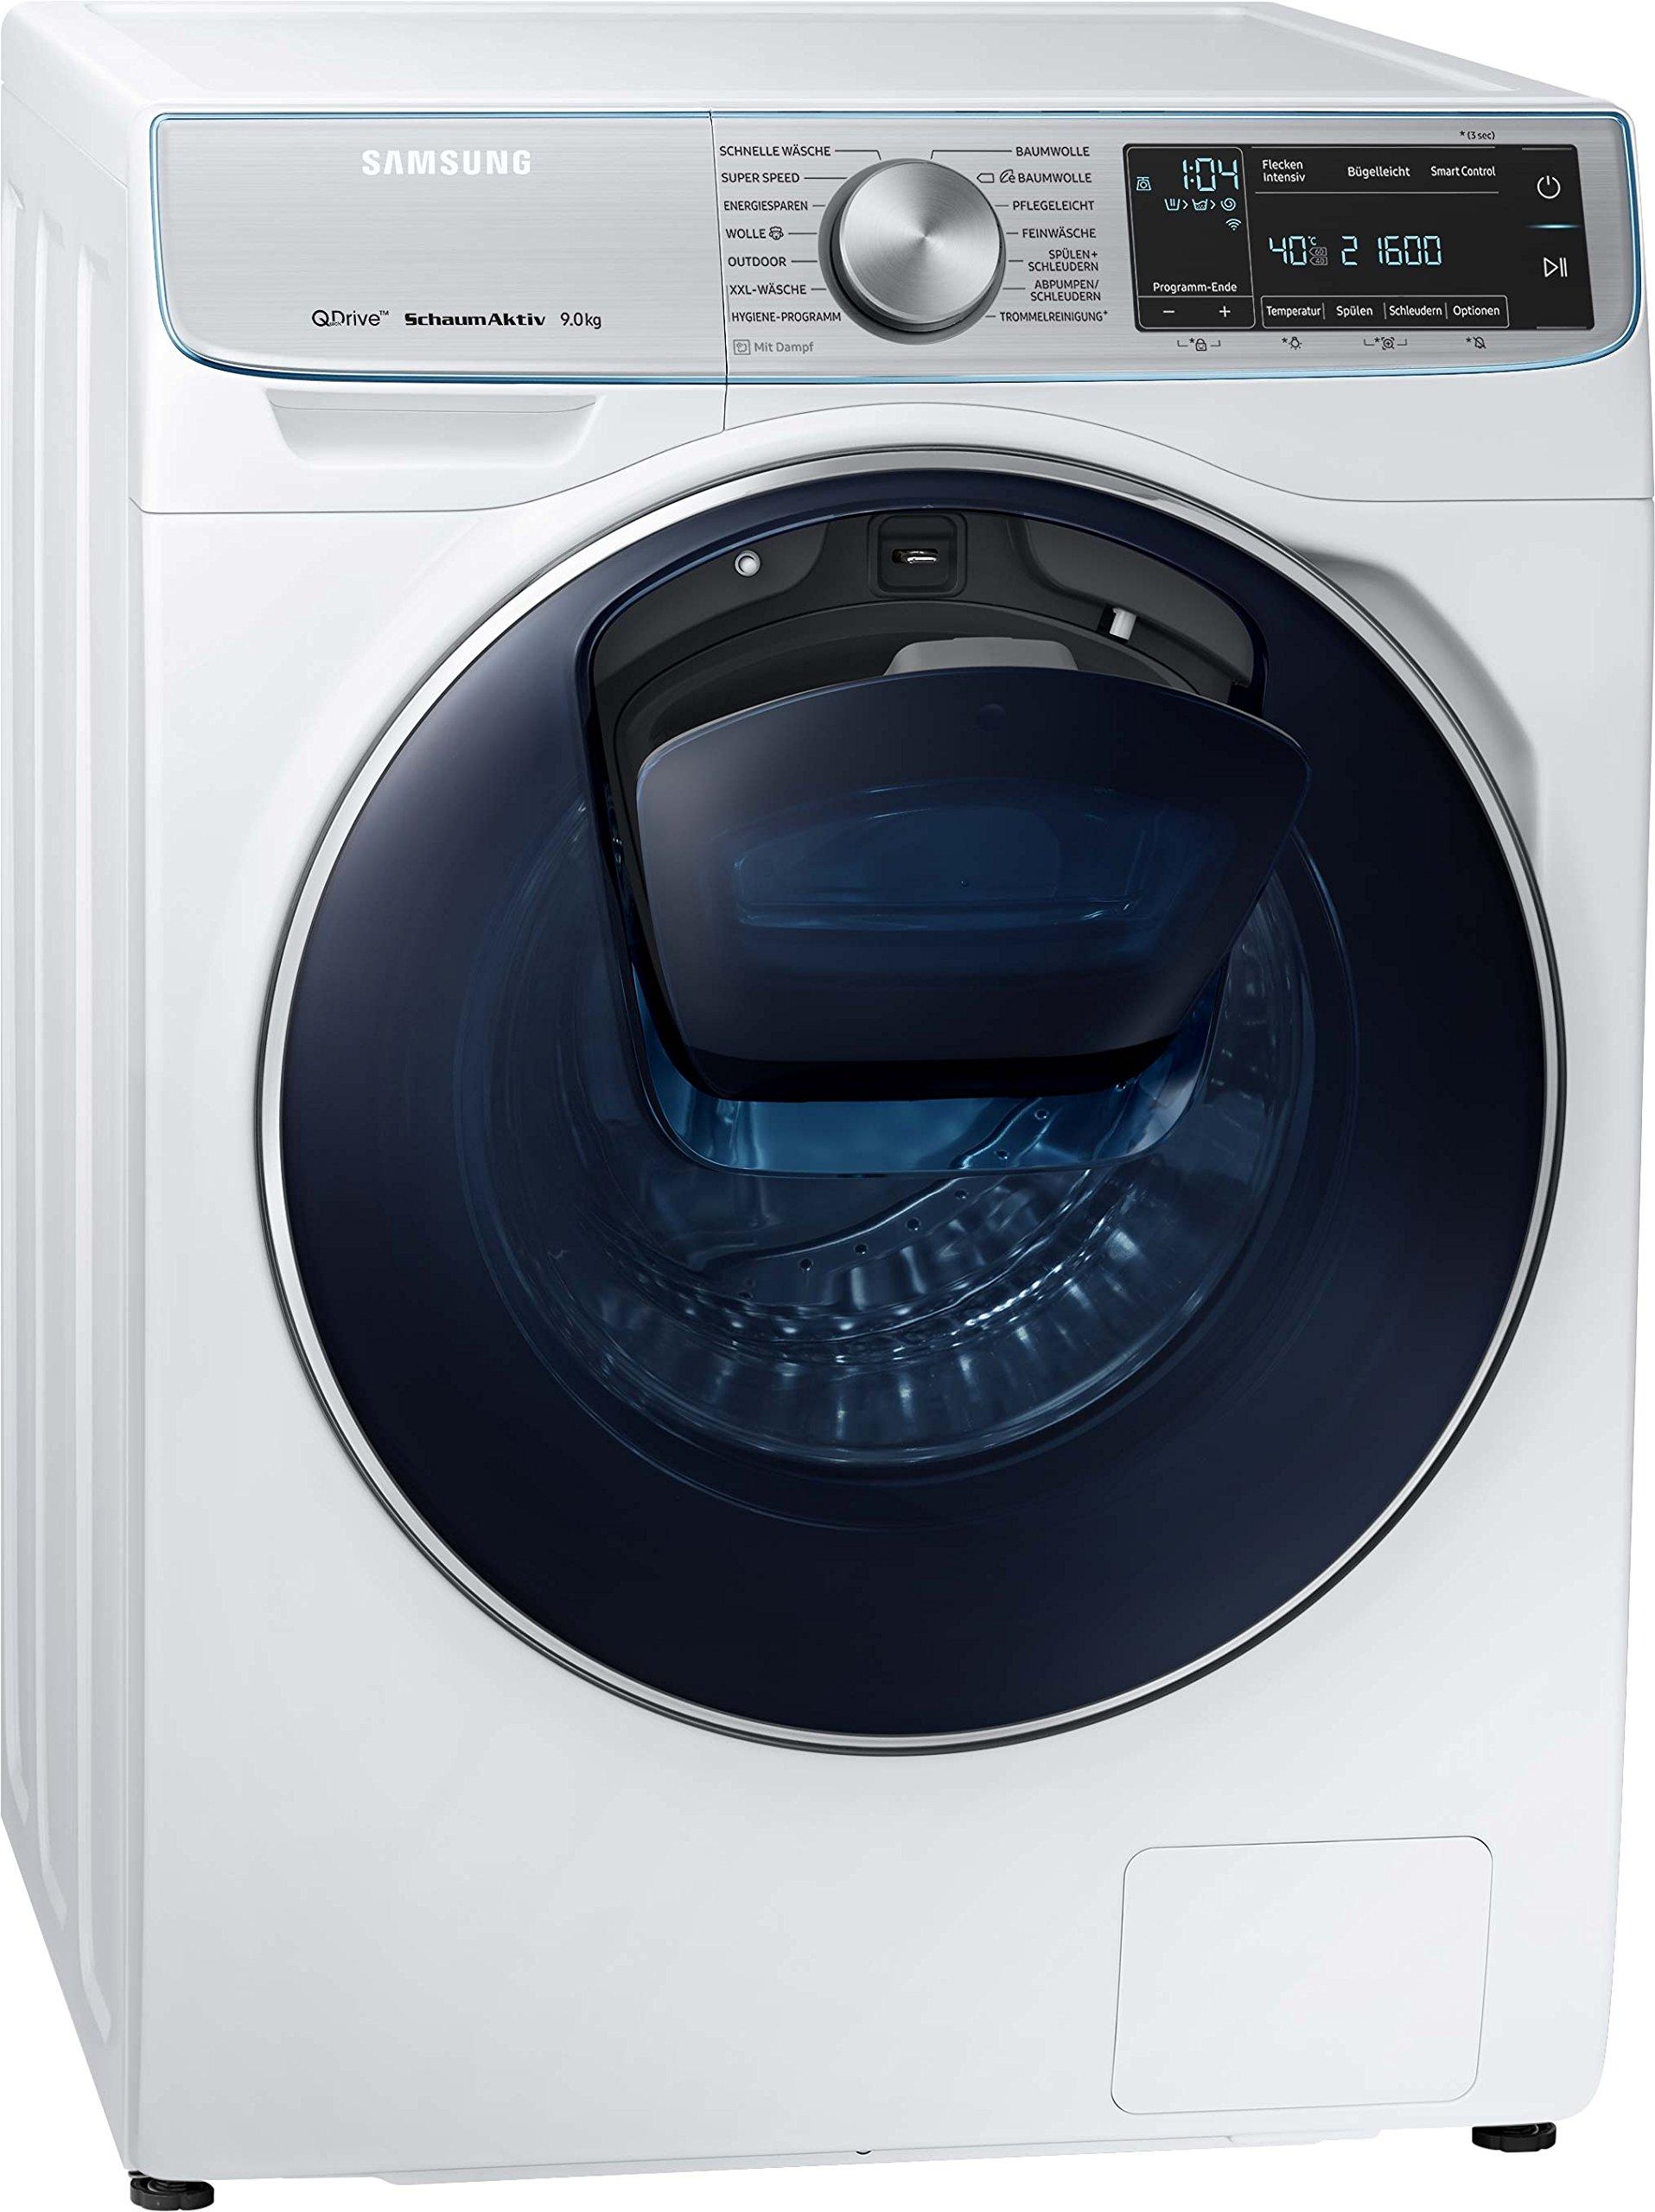 Samsung-WW7800-WW91M760NOAEG-QuickDrive-Waschmaschine-A-1400-Umin-9-kg-Wei-AddWash-SchaumAktiv-WifiAmazon-Dash-Replenishment-fhig